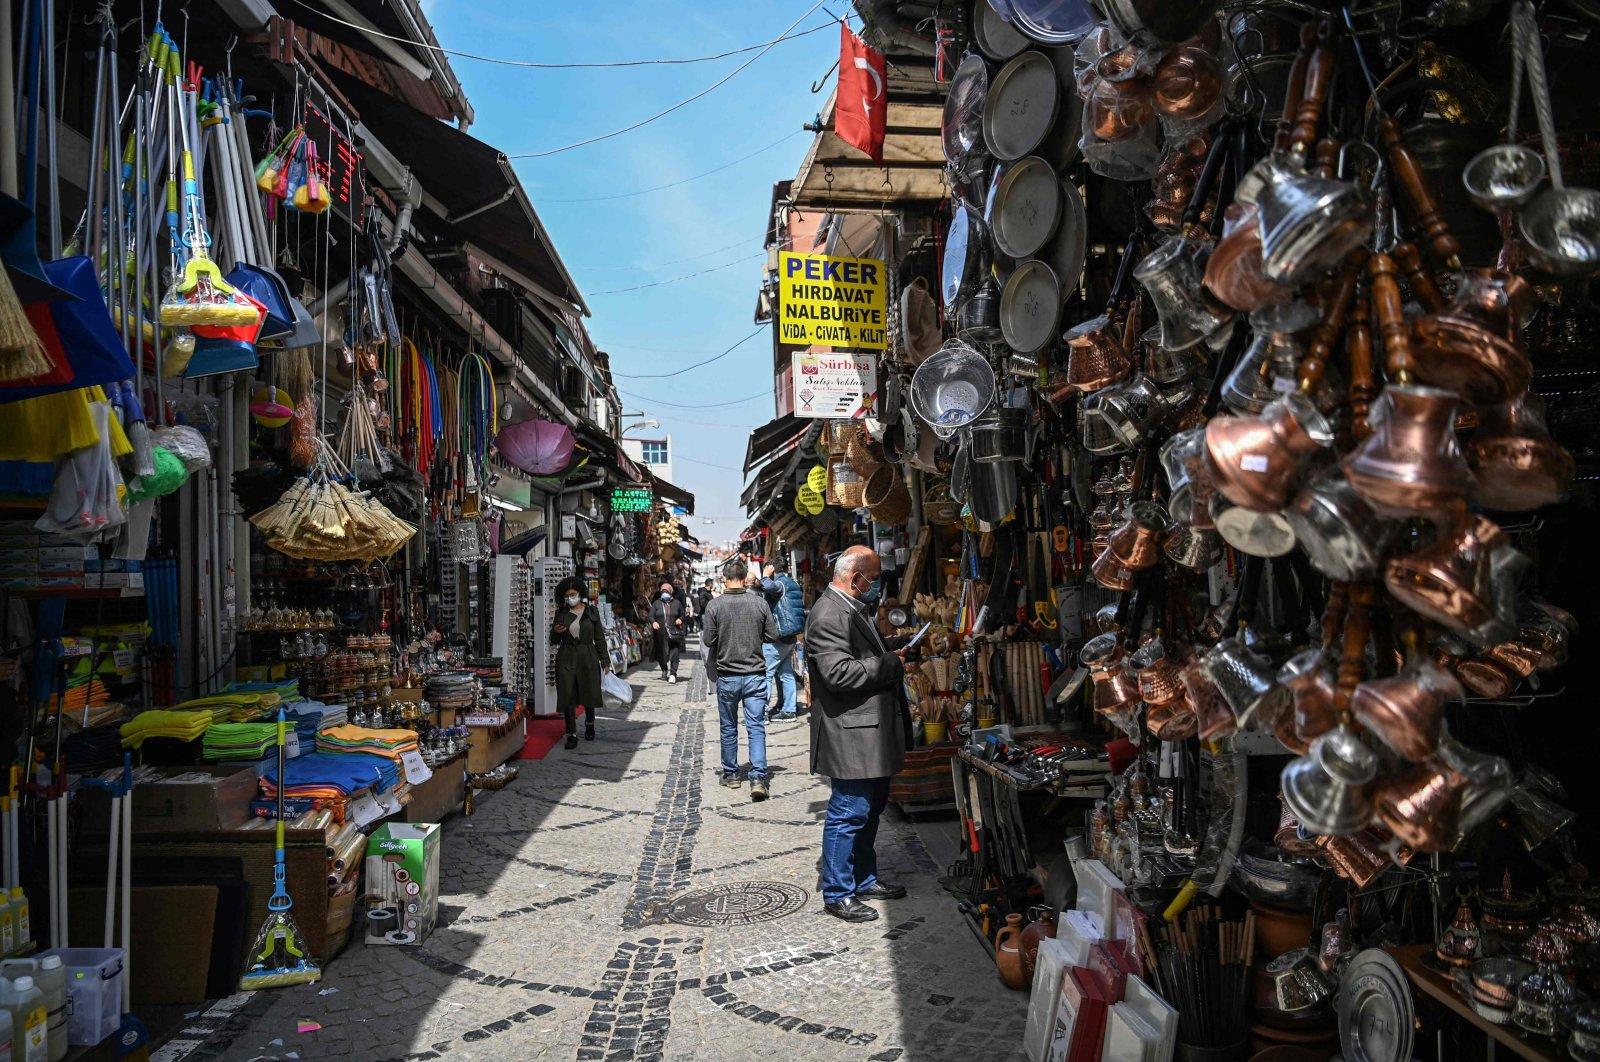 People shop near the Spice Bazaar in the Eminönü neighborhood, Istanbul, Turkey. (AFP Photo)